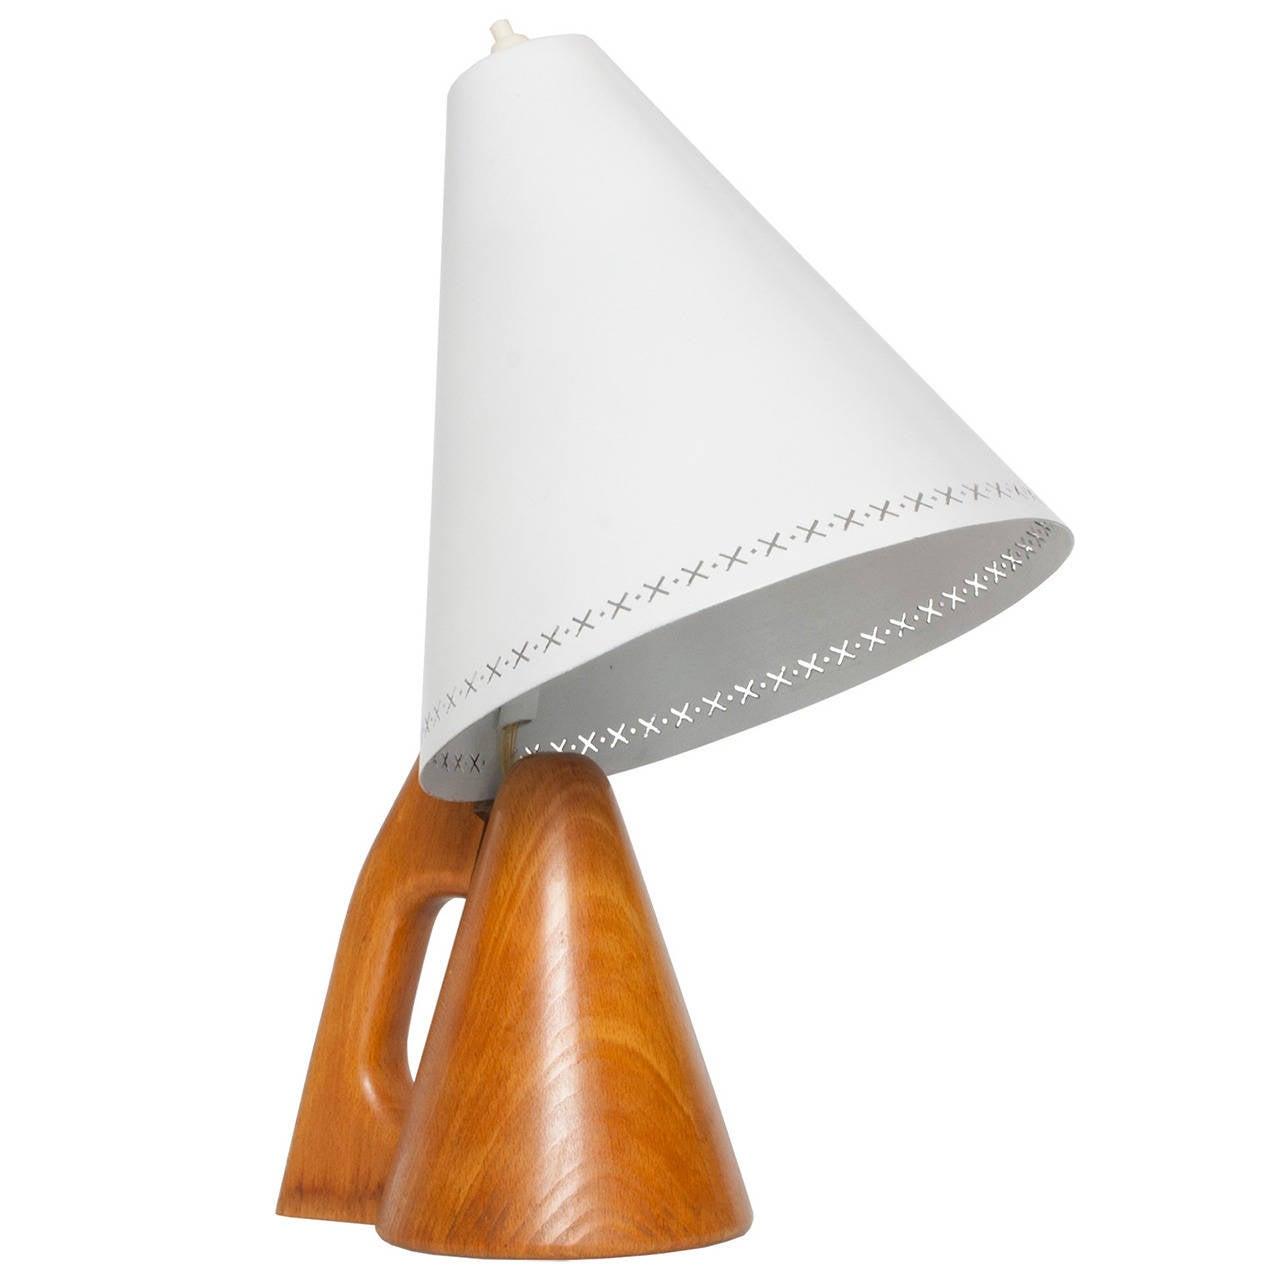 Wooden desk lamp - Scandinavian Modern Wood Desk Lamp With Lacquered Metal Shade 1